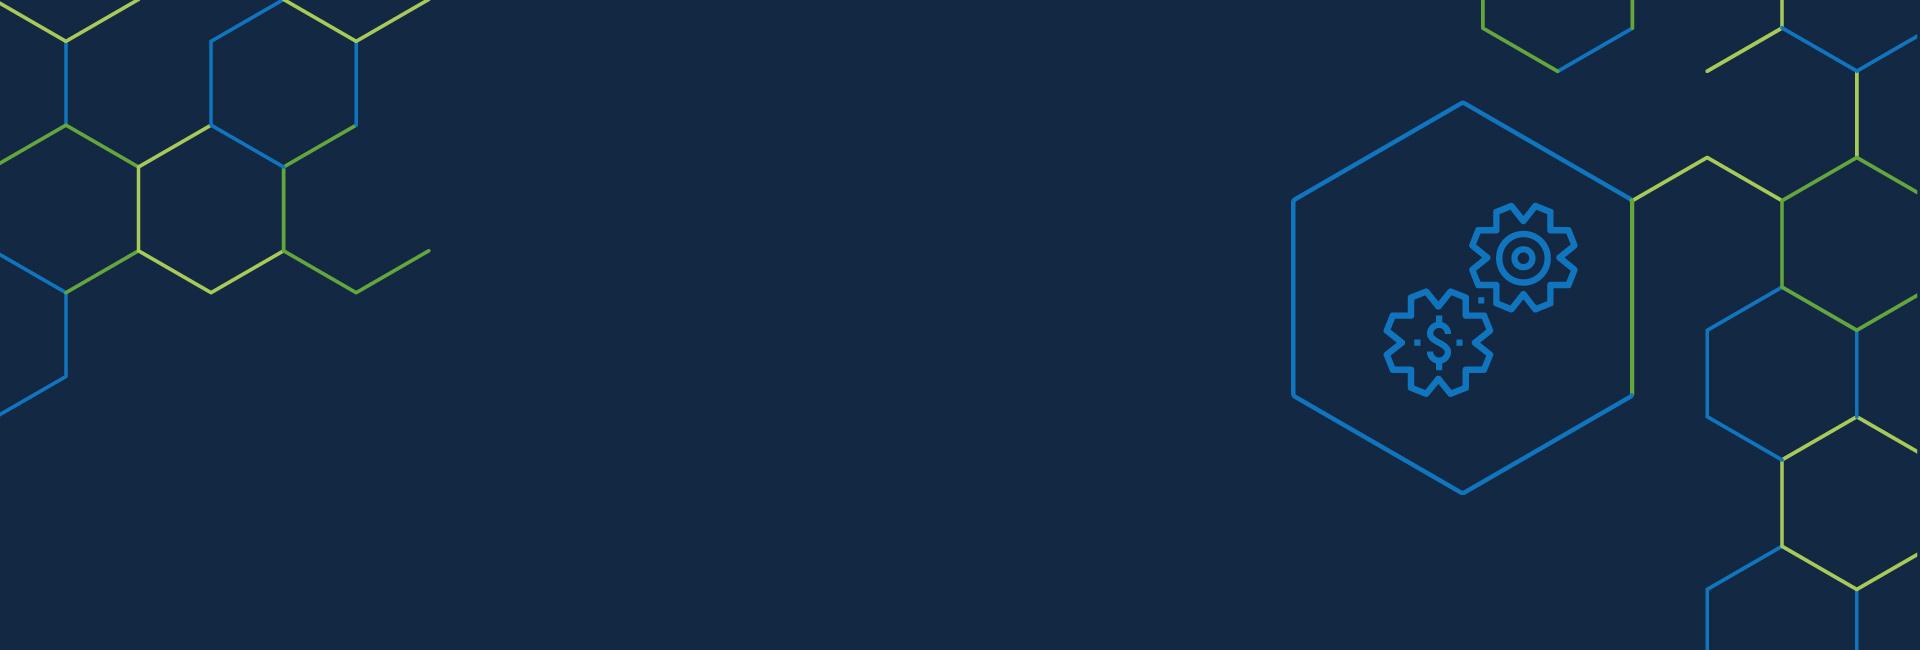 SHS_Webinar-experian-1920x650px-2019-04-11